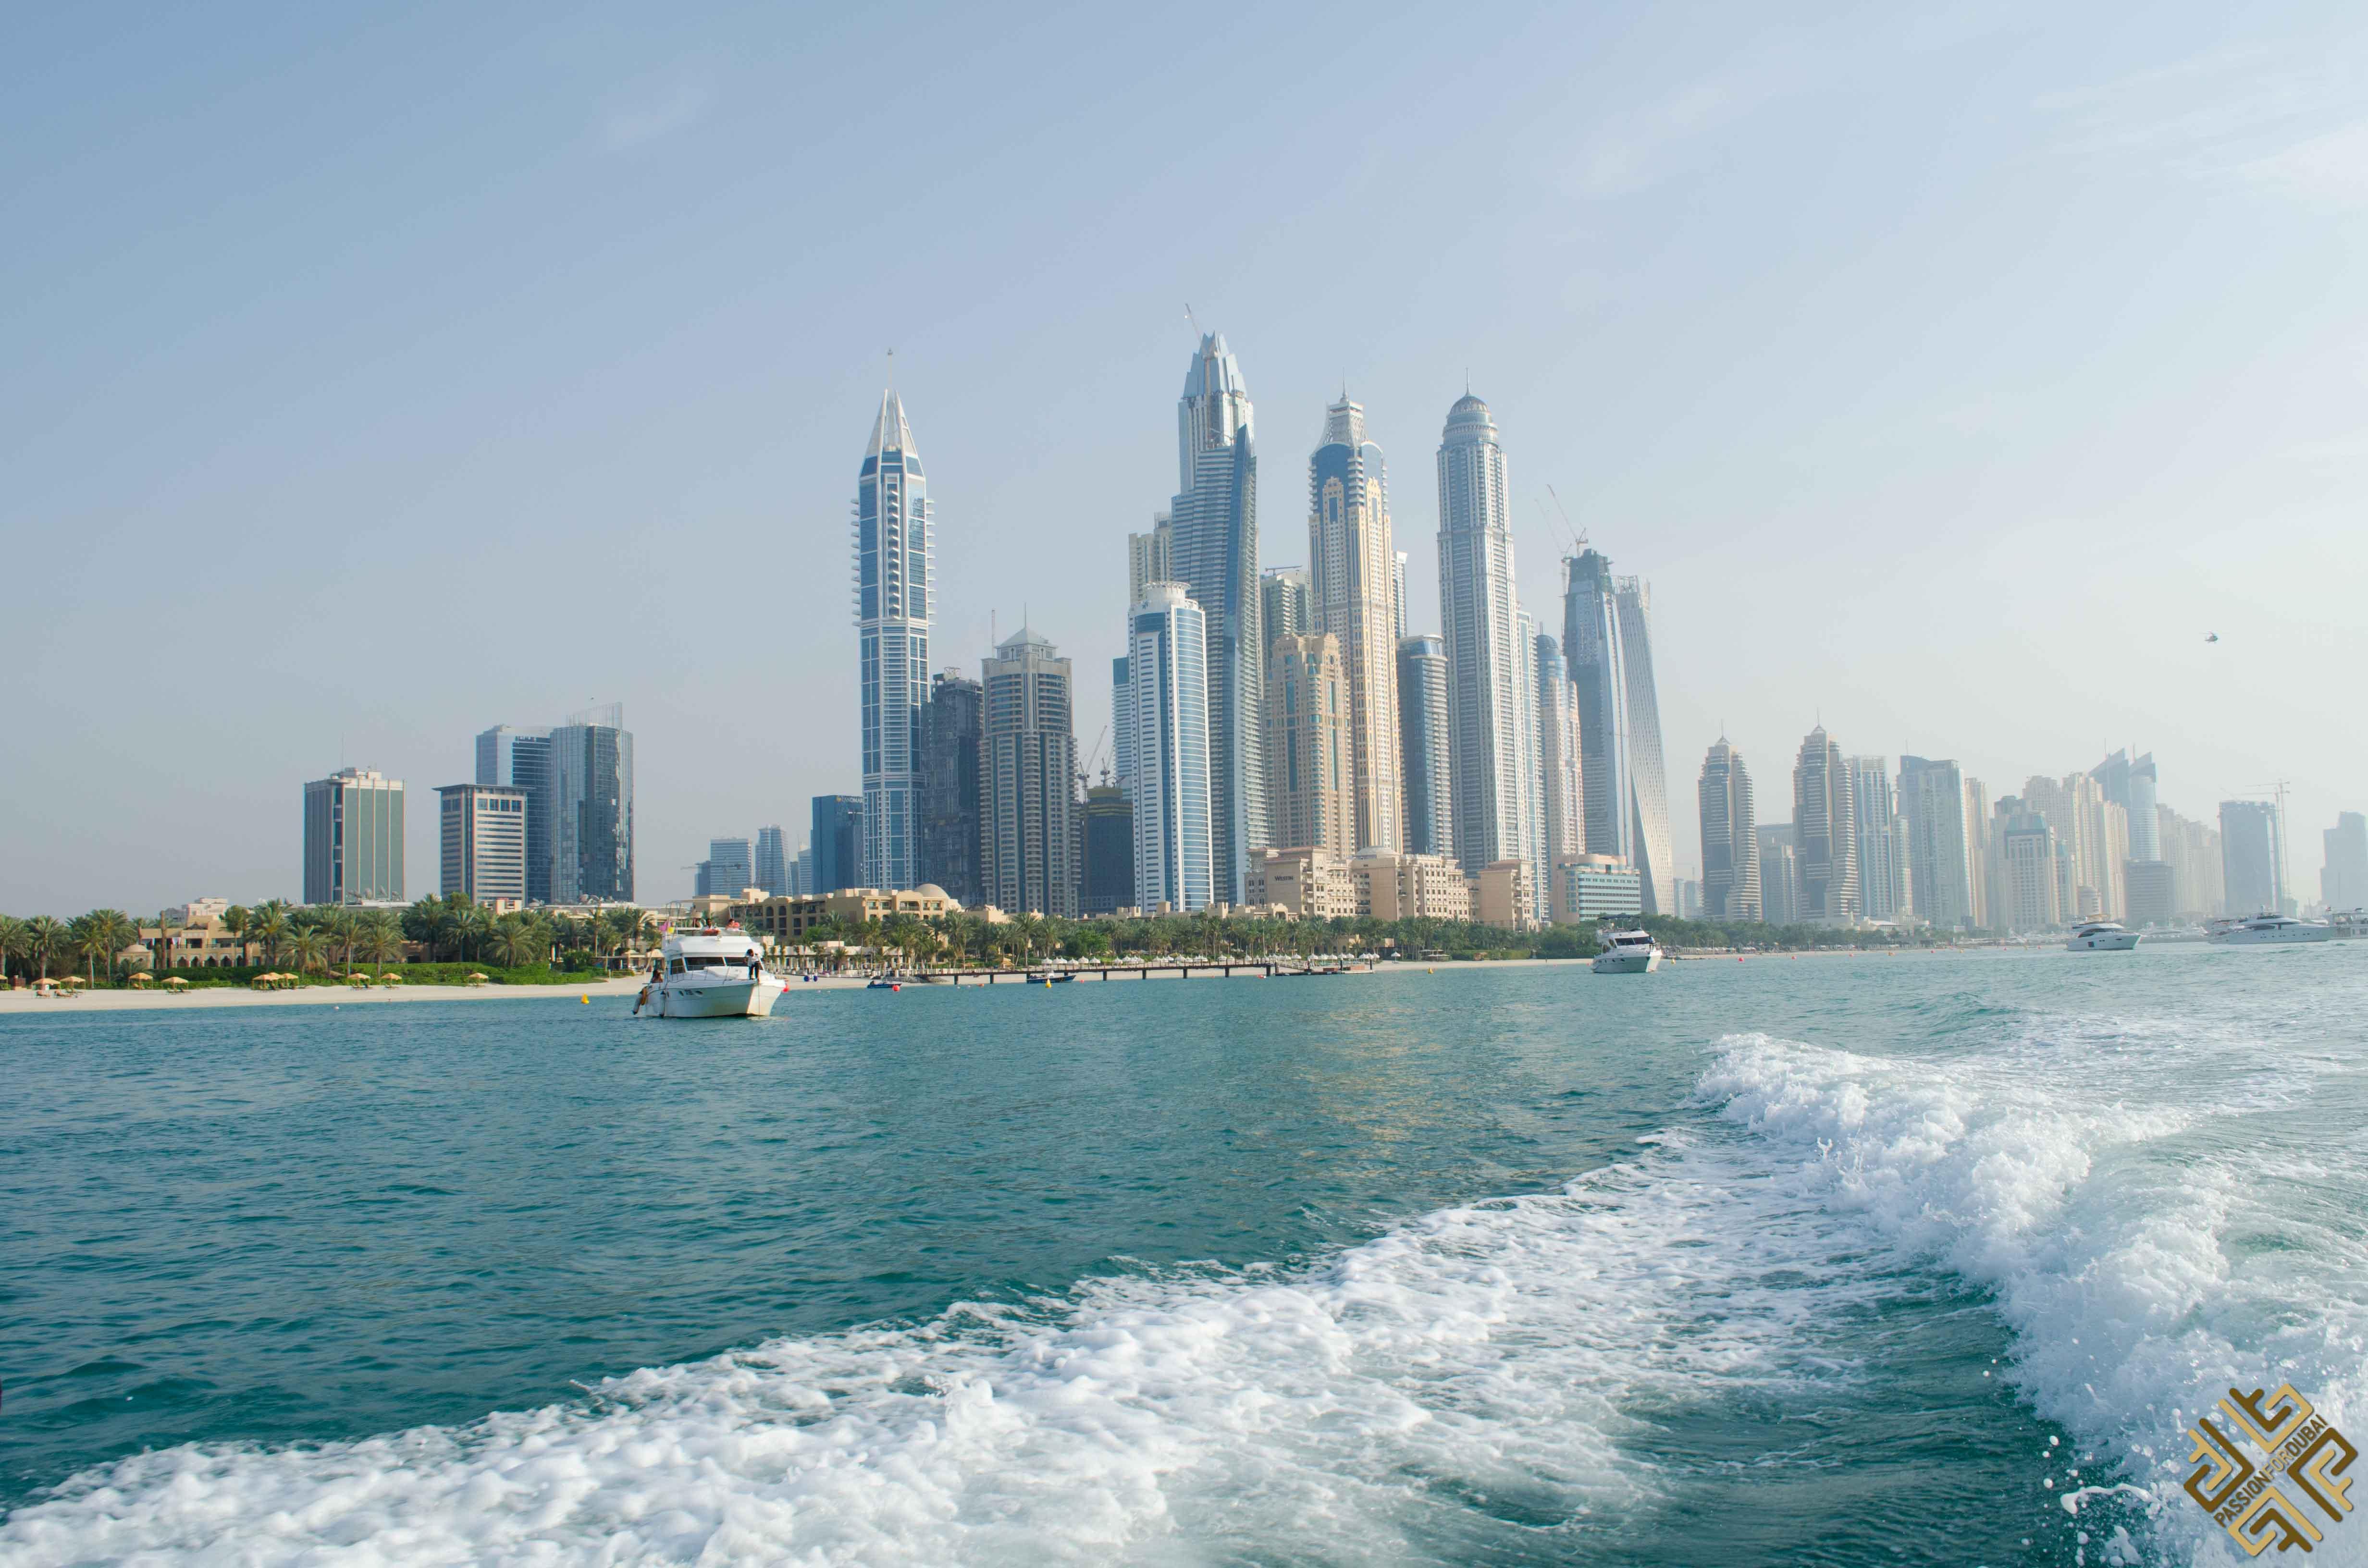 Vip Yachts Dubai Cruising On A Regal 2400rx Jet Boat